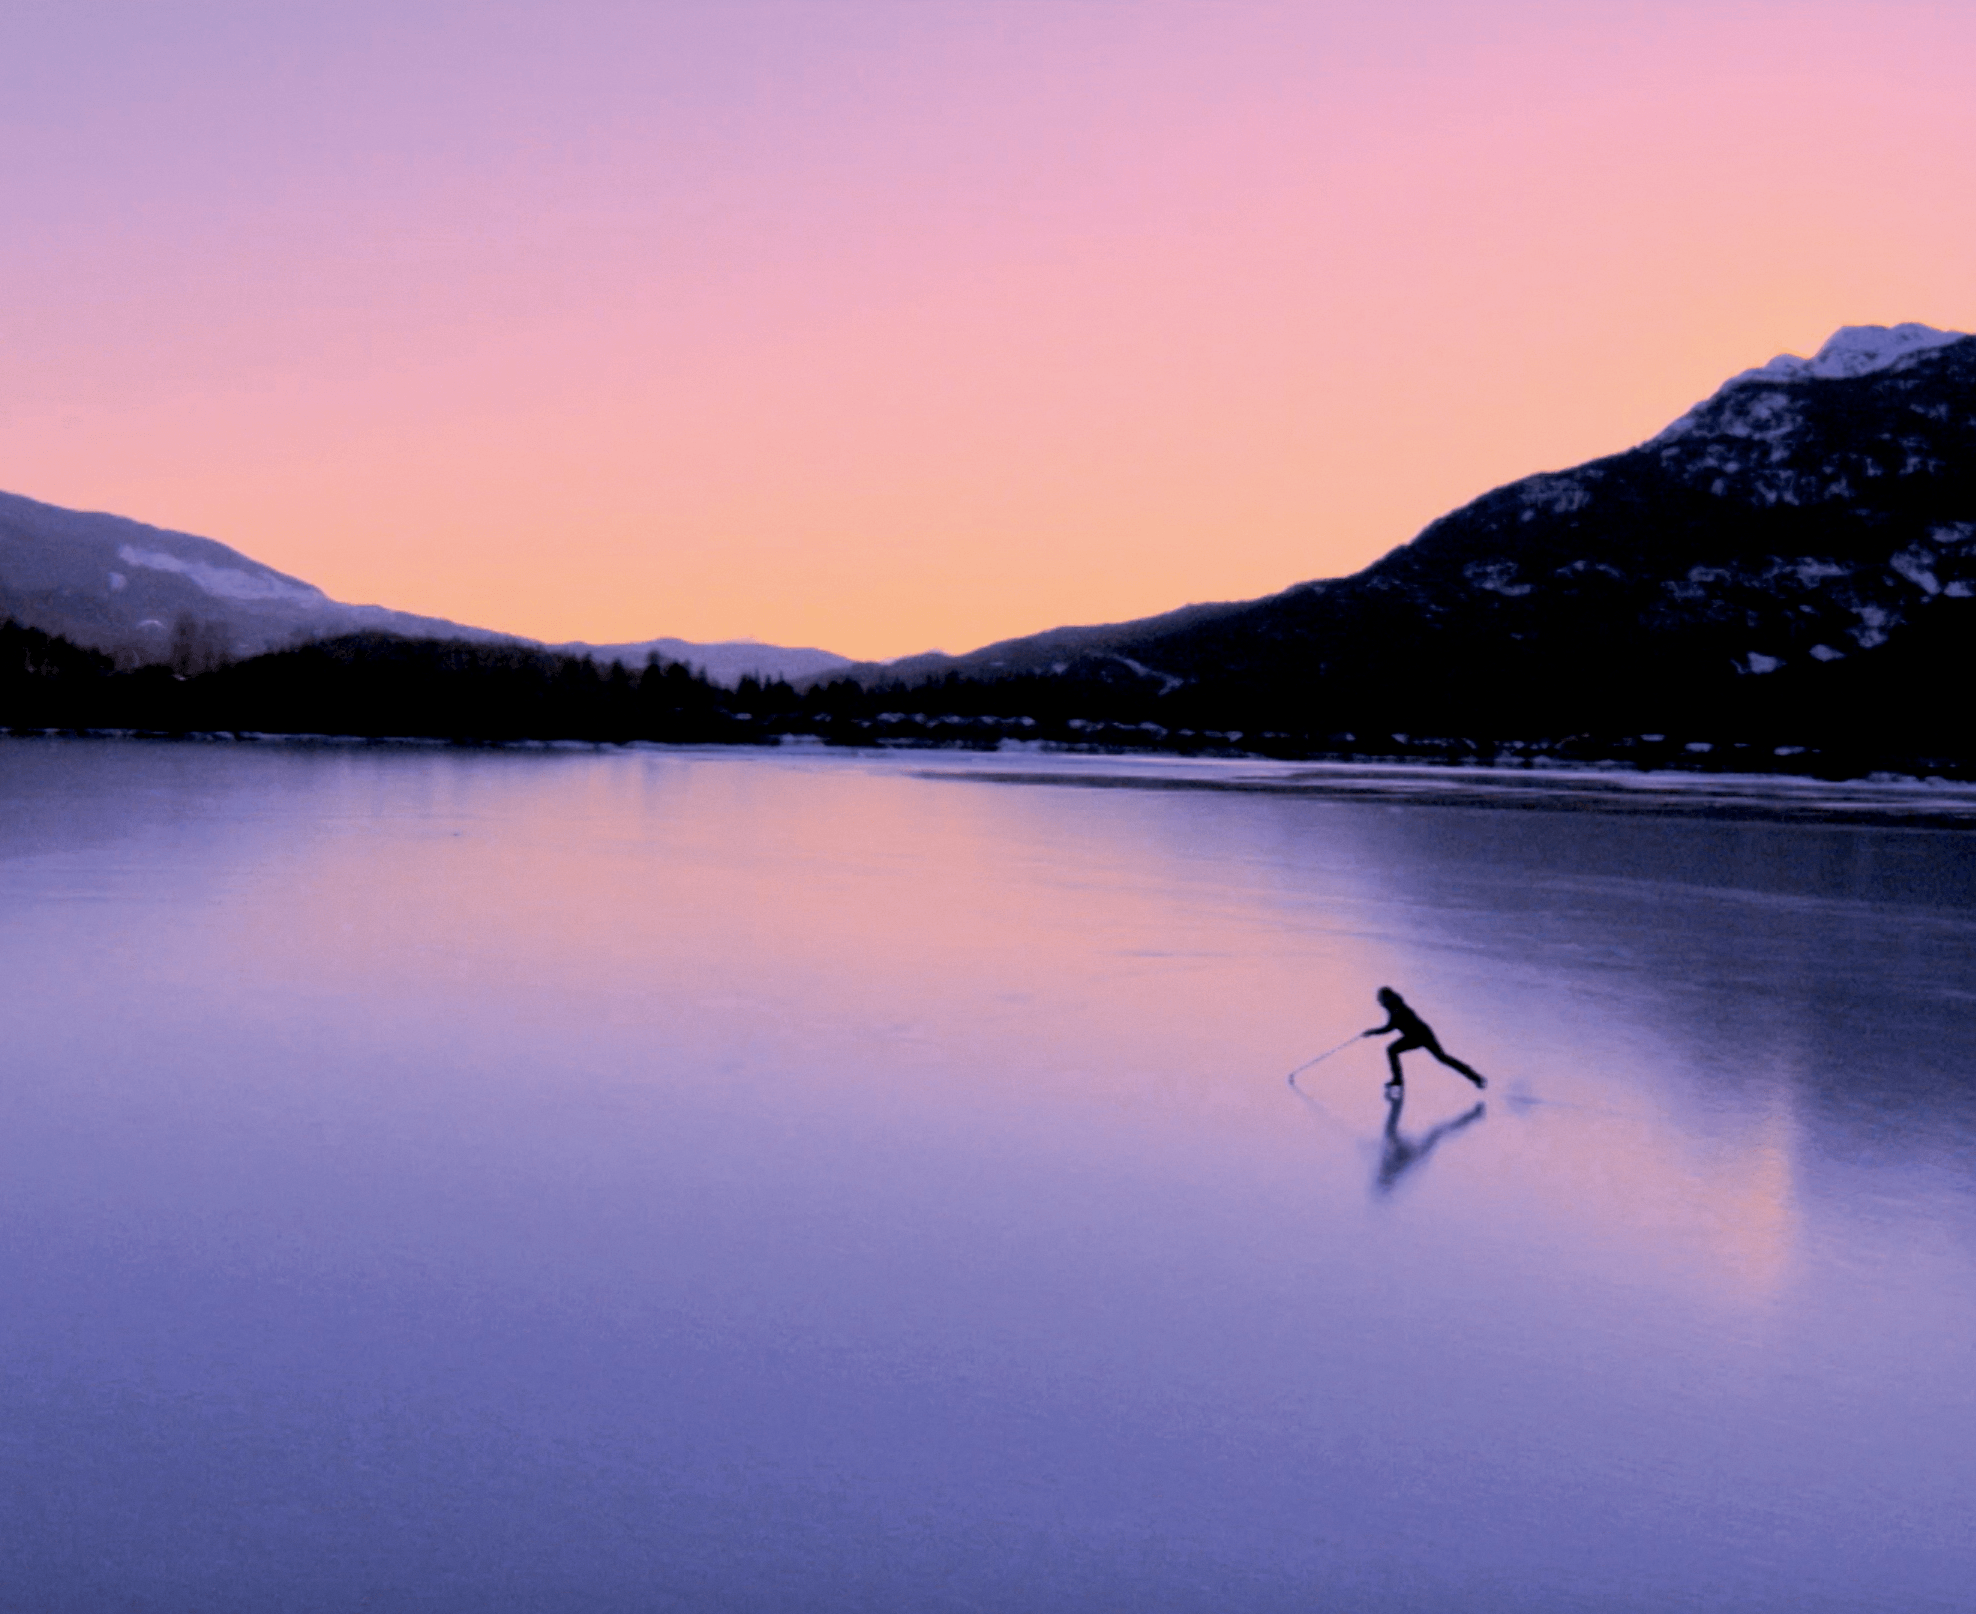 landscape - someone skating on a frozen lake